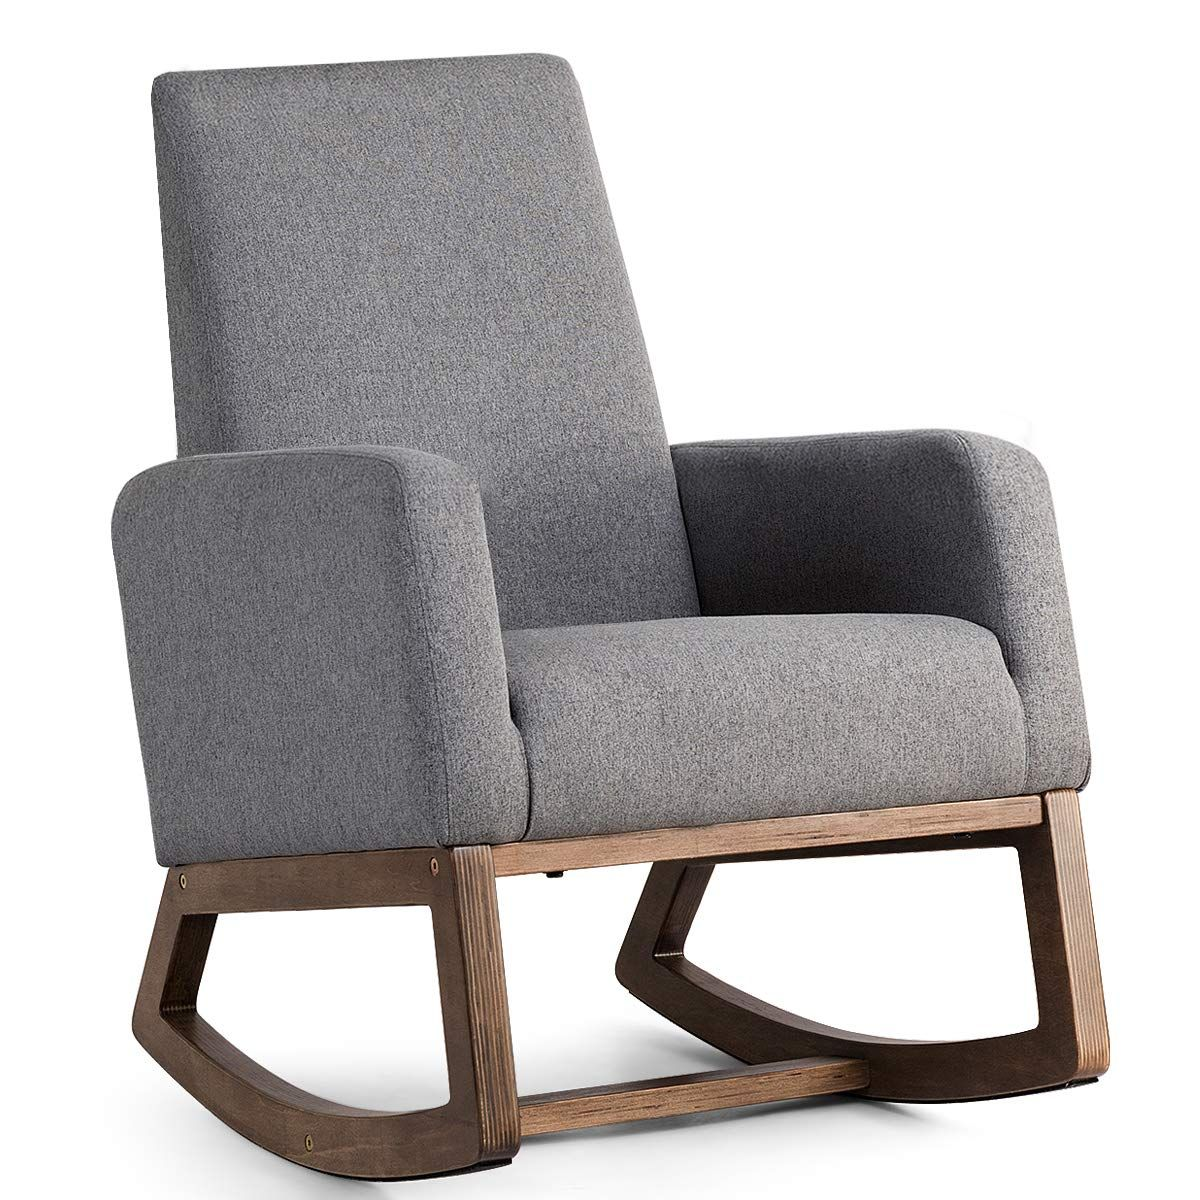 Amazon Com Giantex Upholstered Rocking Chair Modern High Back Armchair Comfortable Rocker F Upholstered Rocking Chairs Mid Century Rocking Chair Rocking Chair